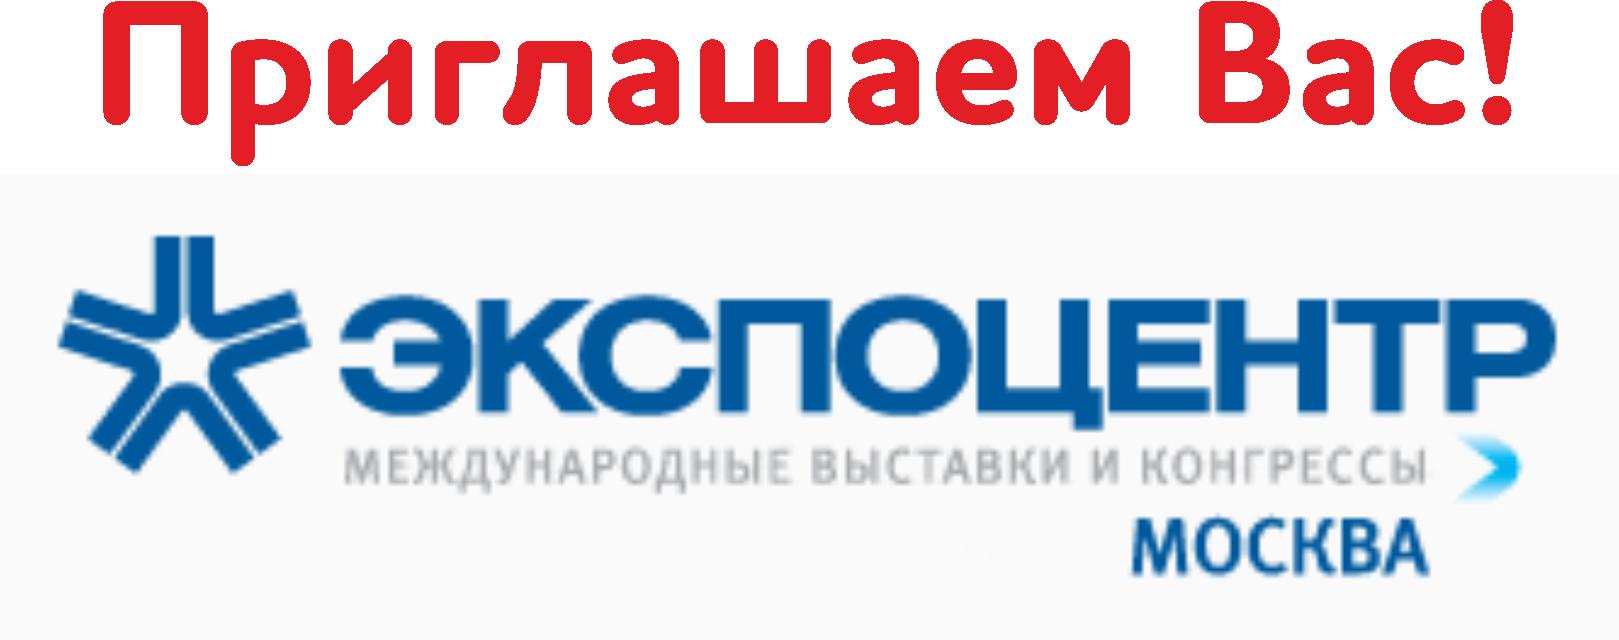 Экспоцентр.png